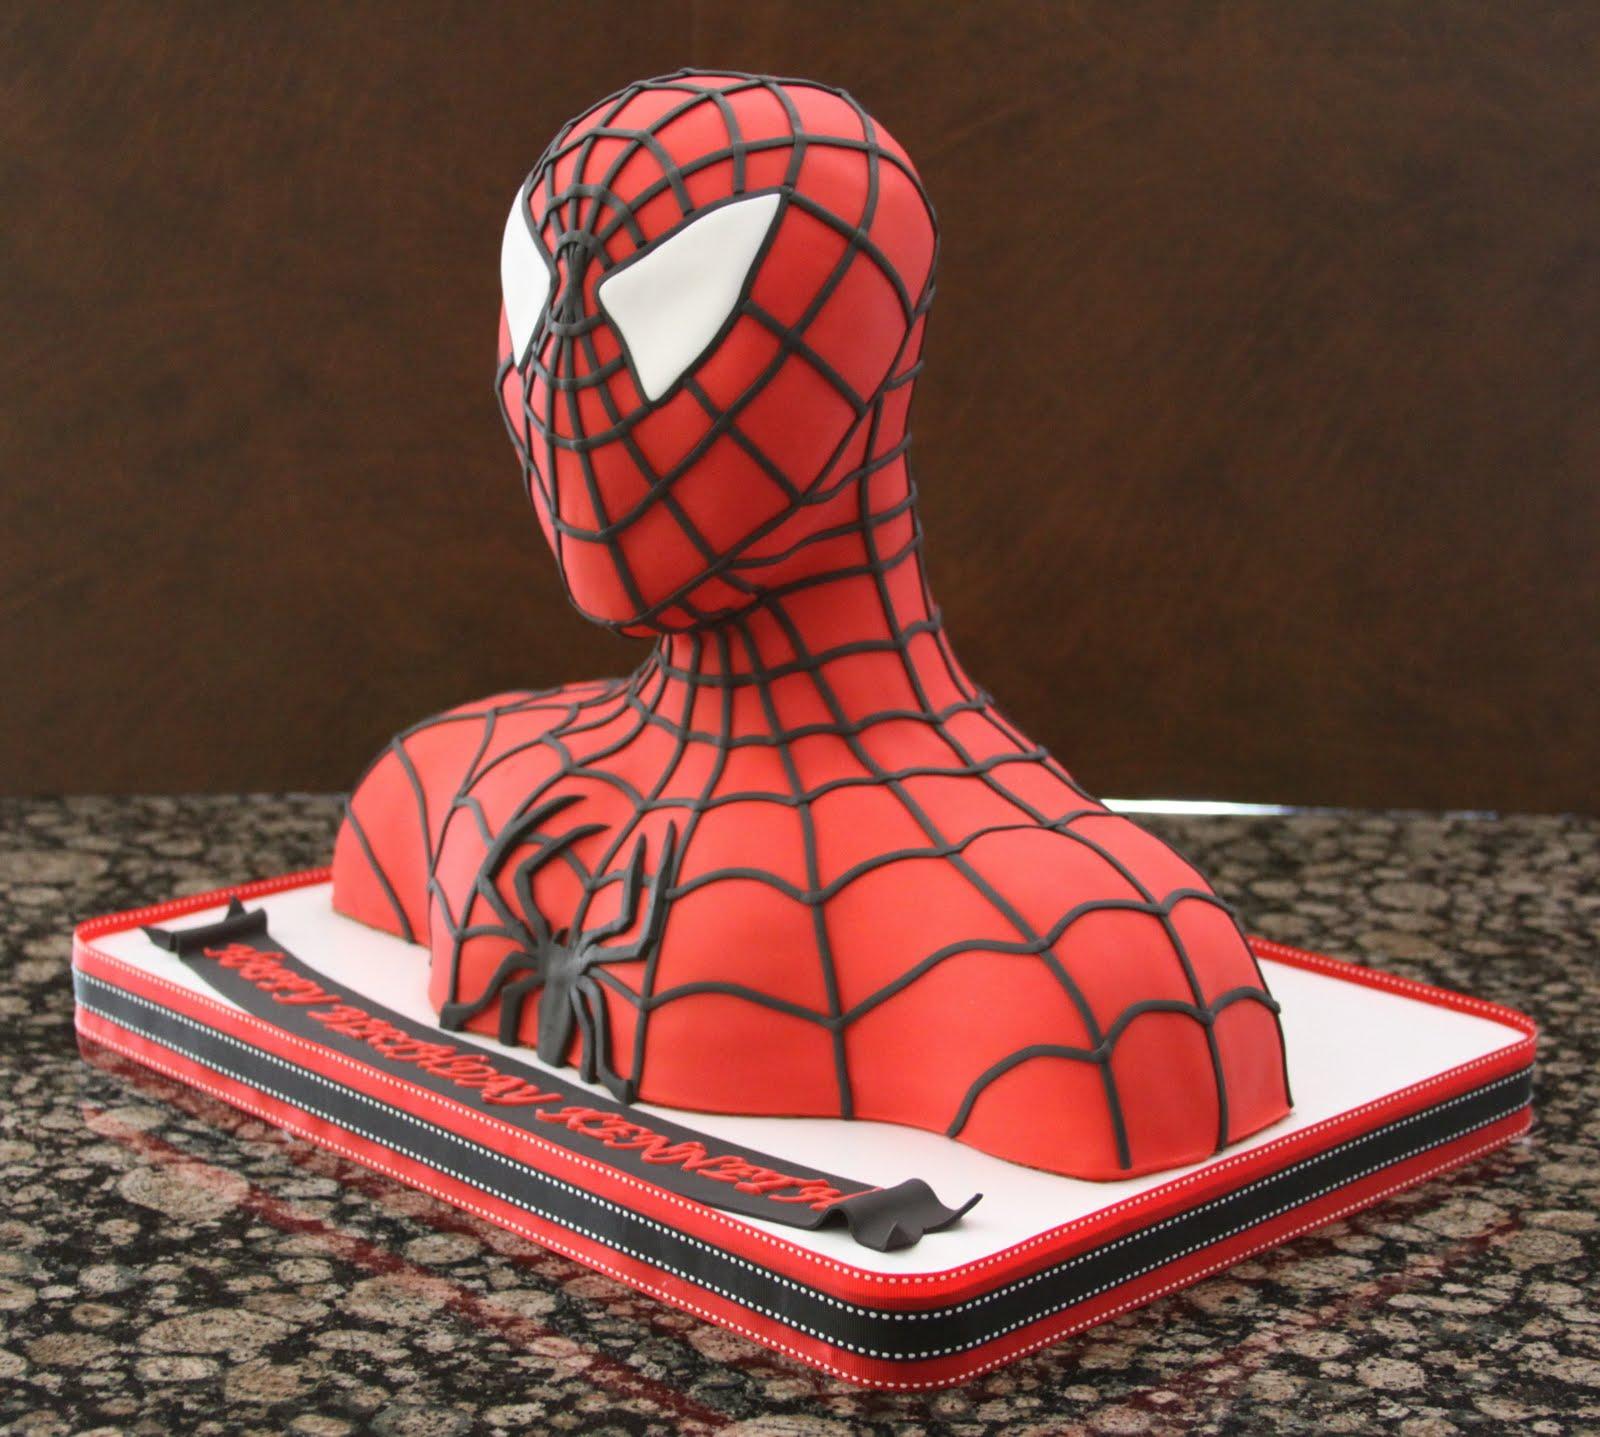 Spiderman Cake And Superhero Cake Pops